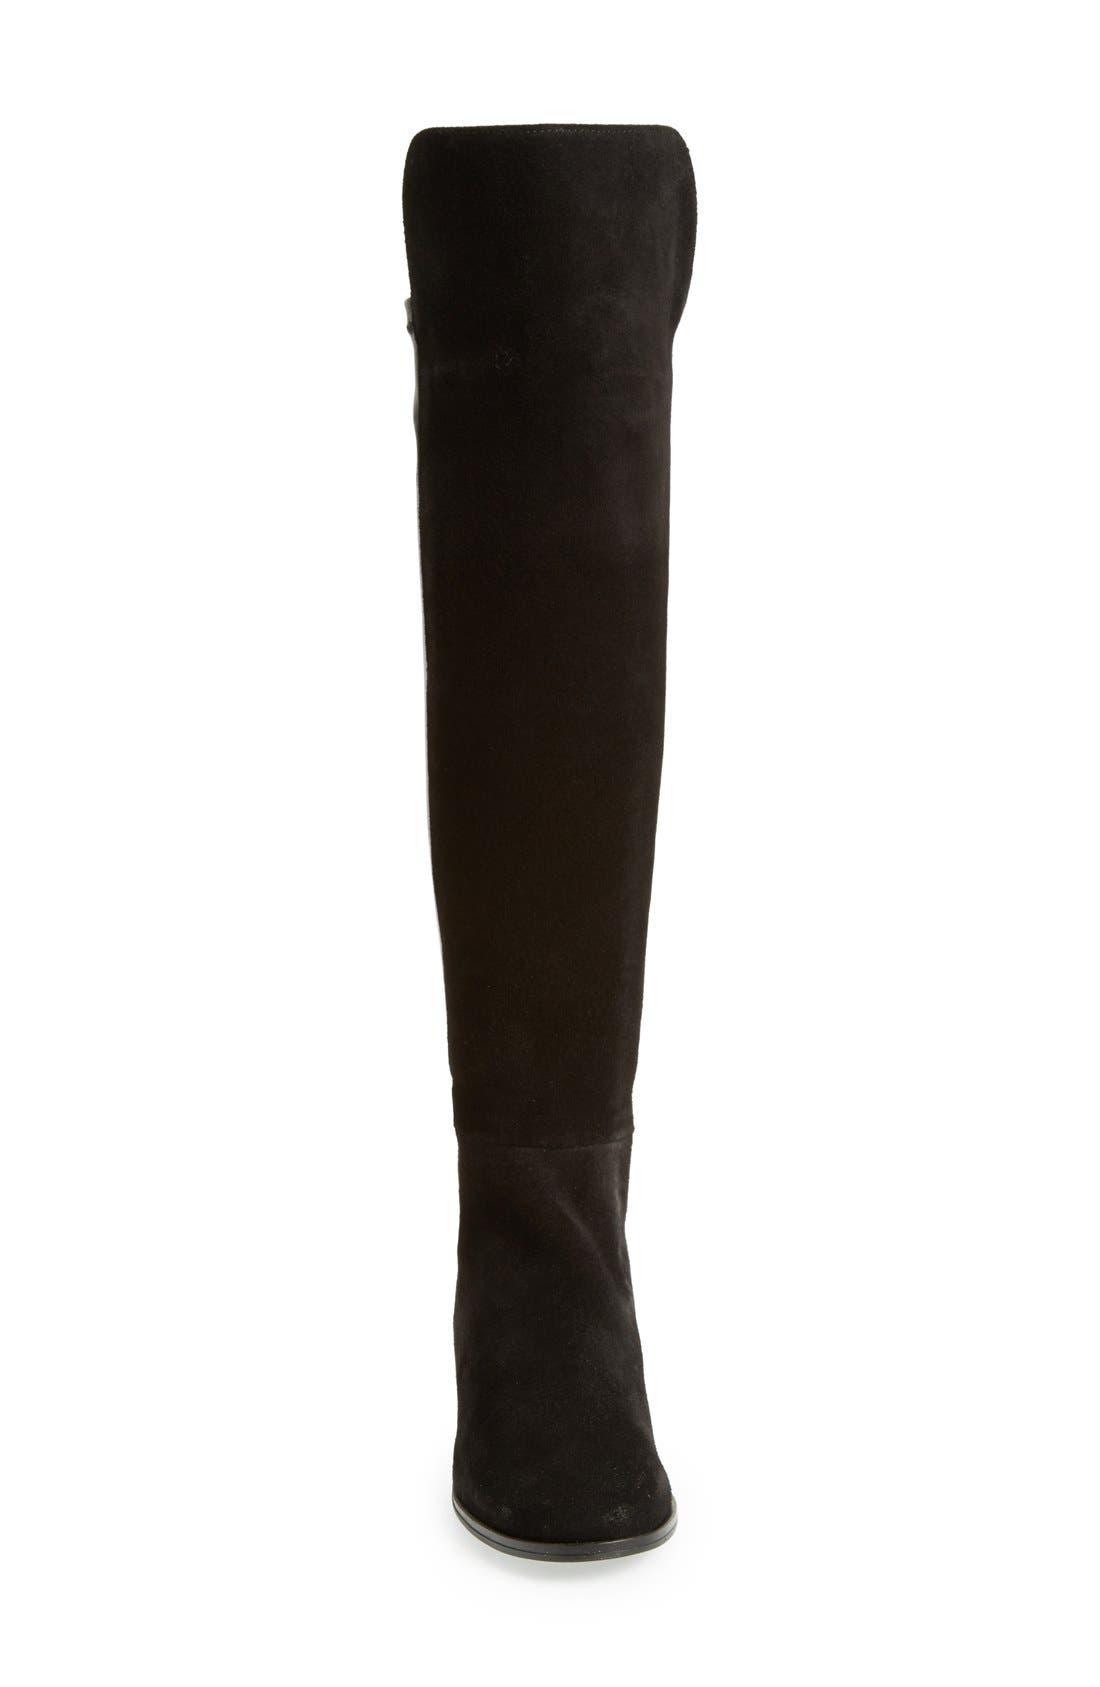 Alternate Image 3  - Dune London 'Trish' Over the Knee Boot (Women)